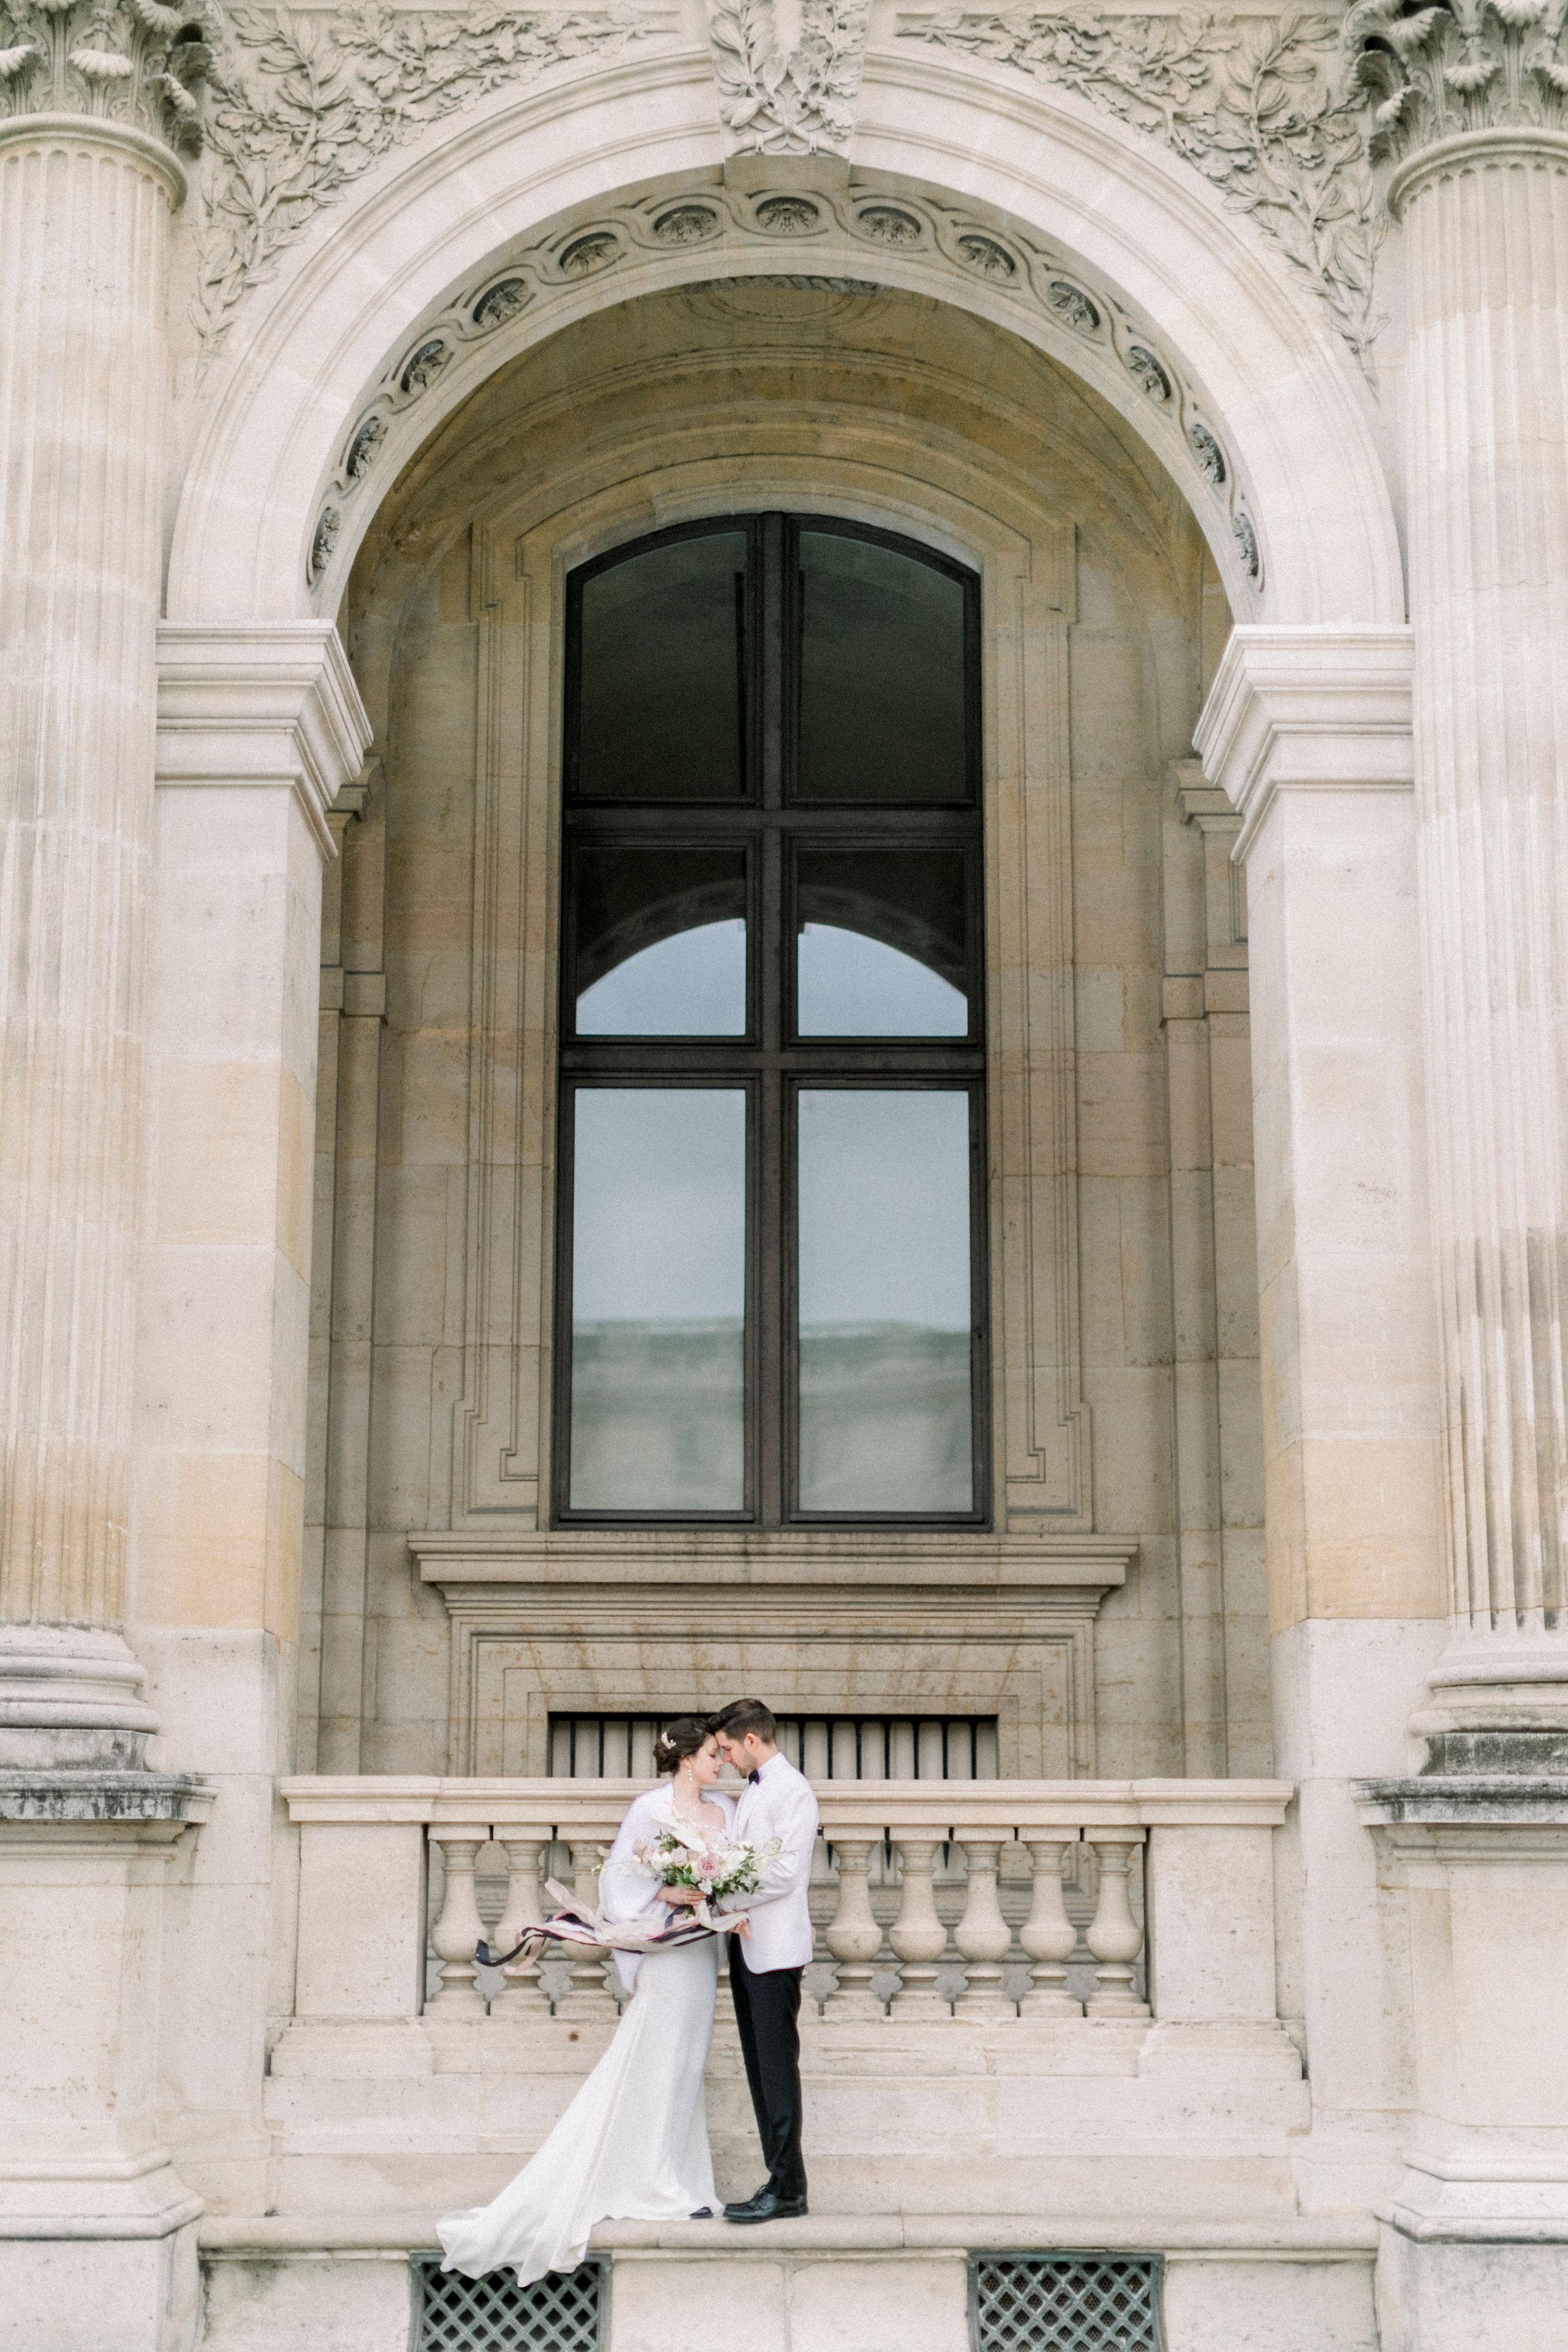 Anja_Schneemann_photography_Paris_Julia_Ilyas_030319-293.jpg